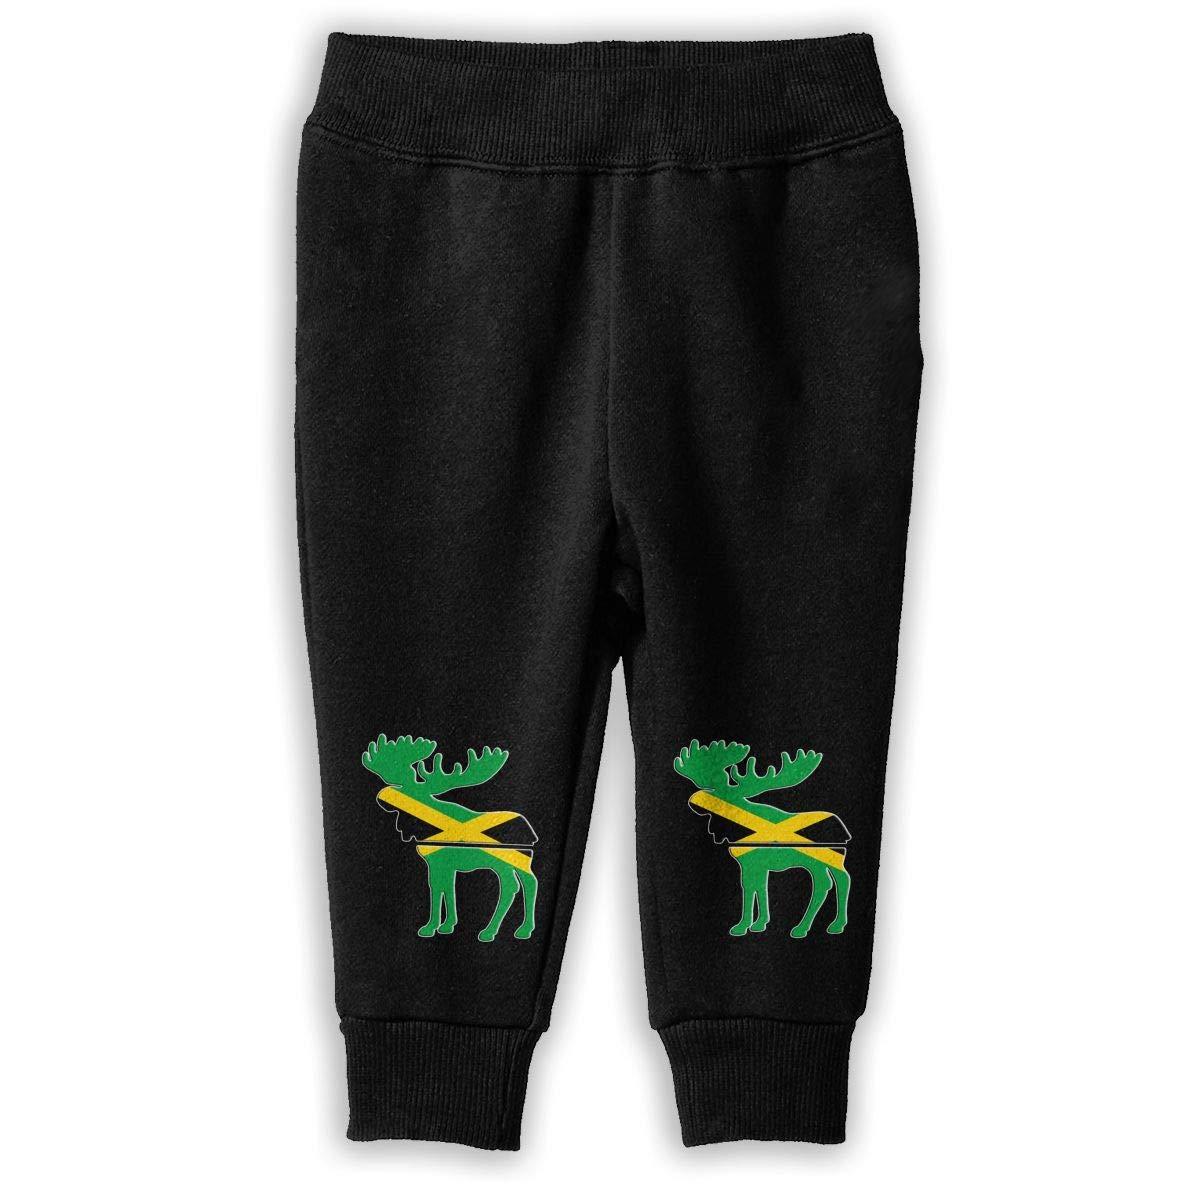 NJKM5MJ Moose Jamaica Flag Sweatpants Baby Boys Athletic Pants